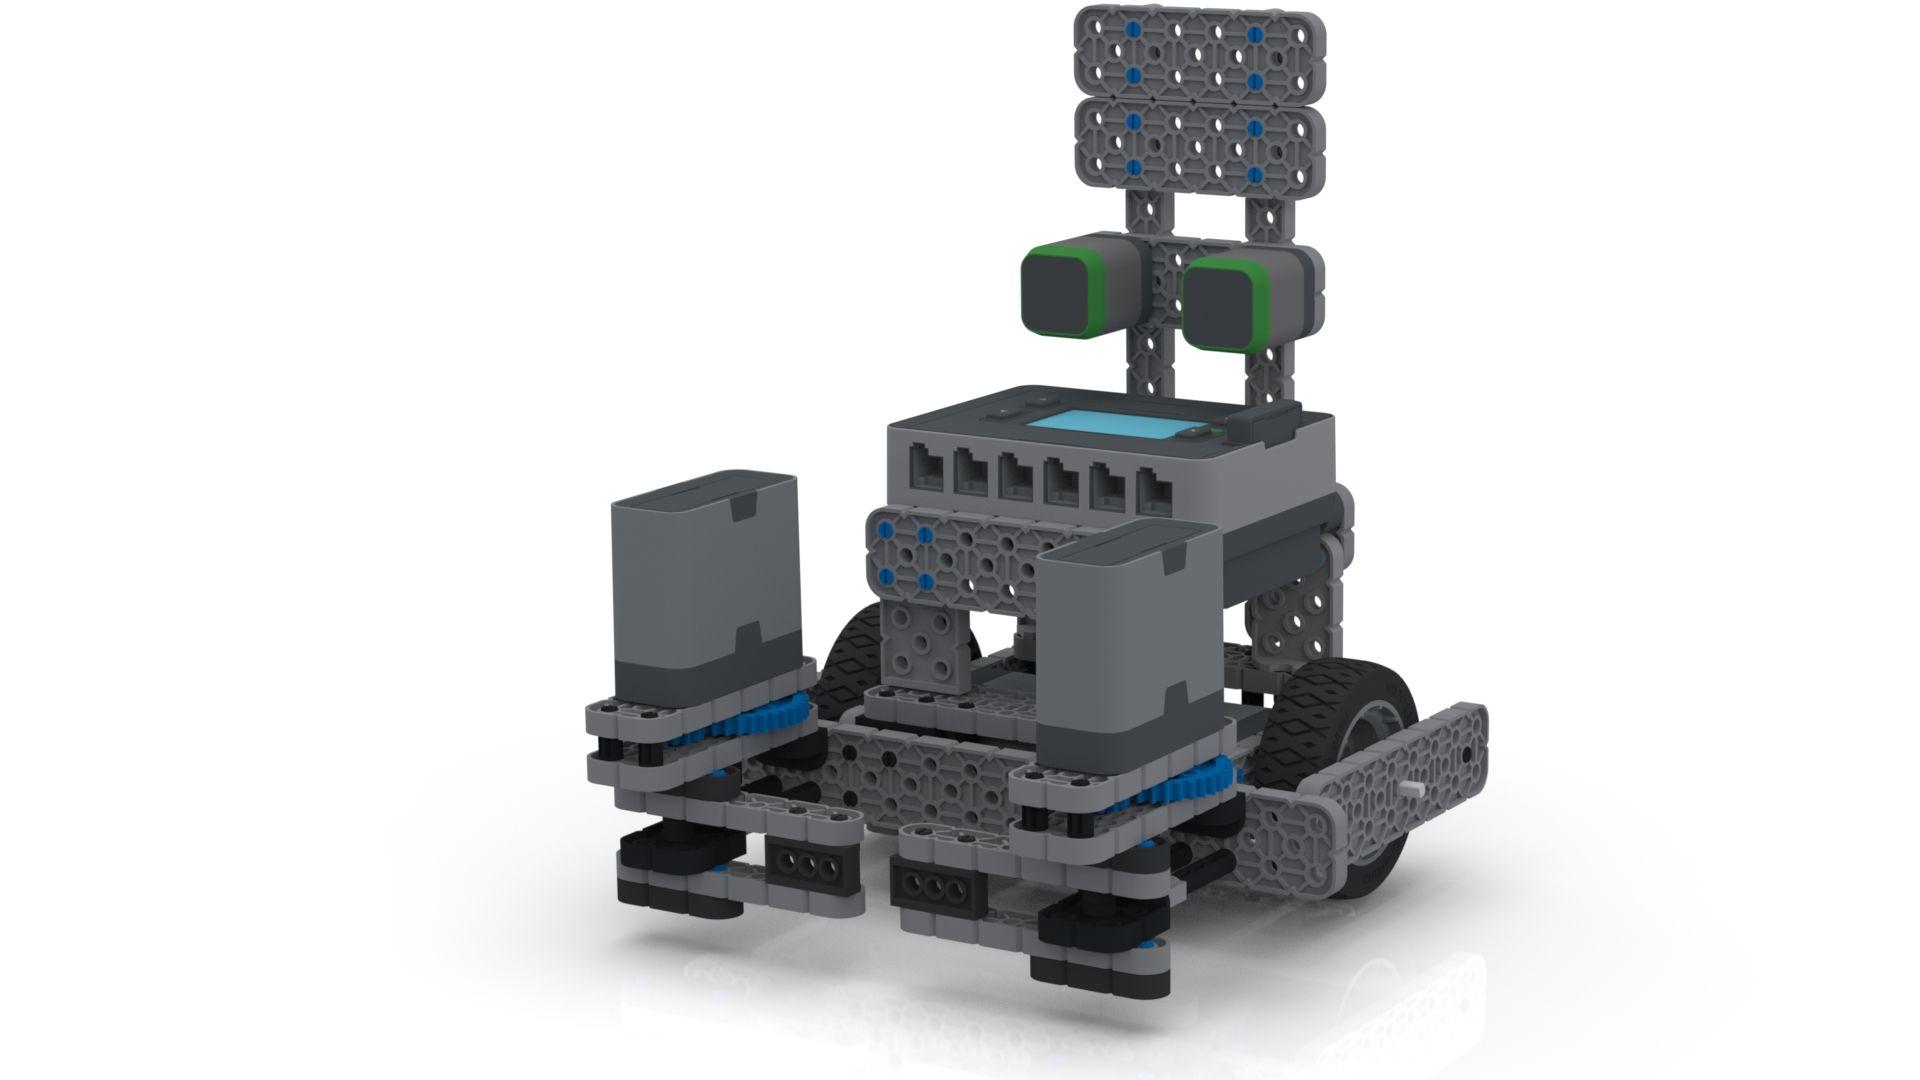 Fabrica-de-nerdes-vex-iq-lucas7-3500-3500